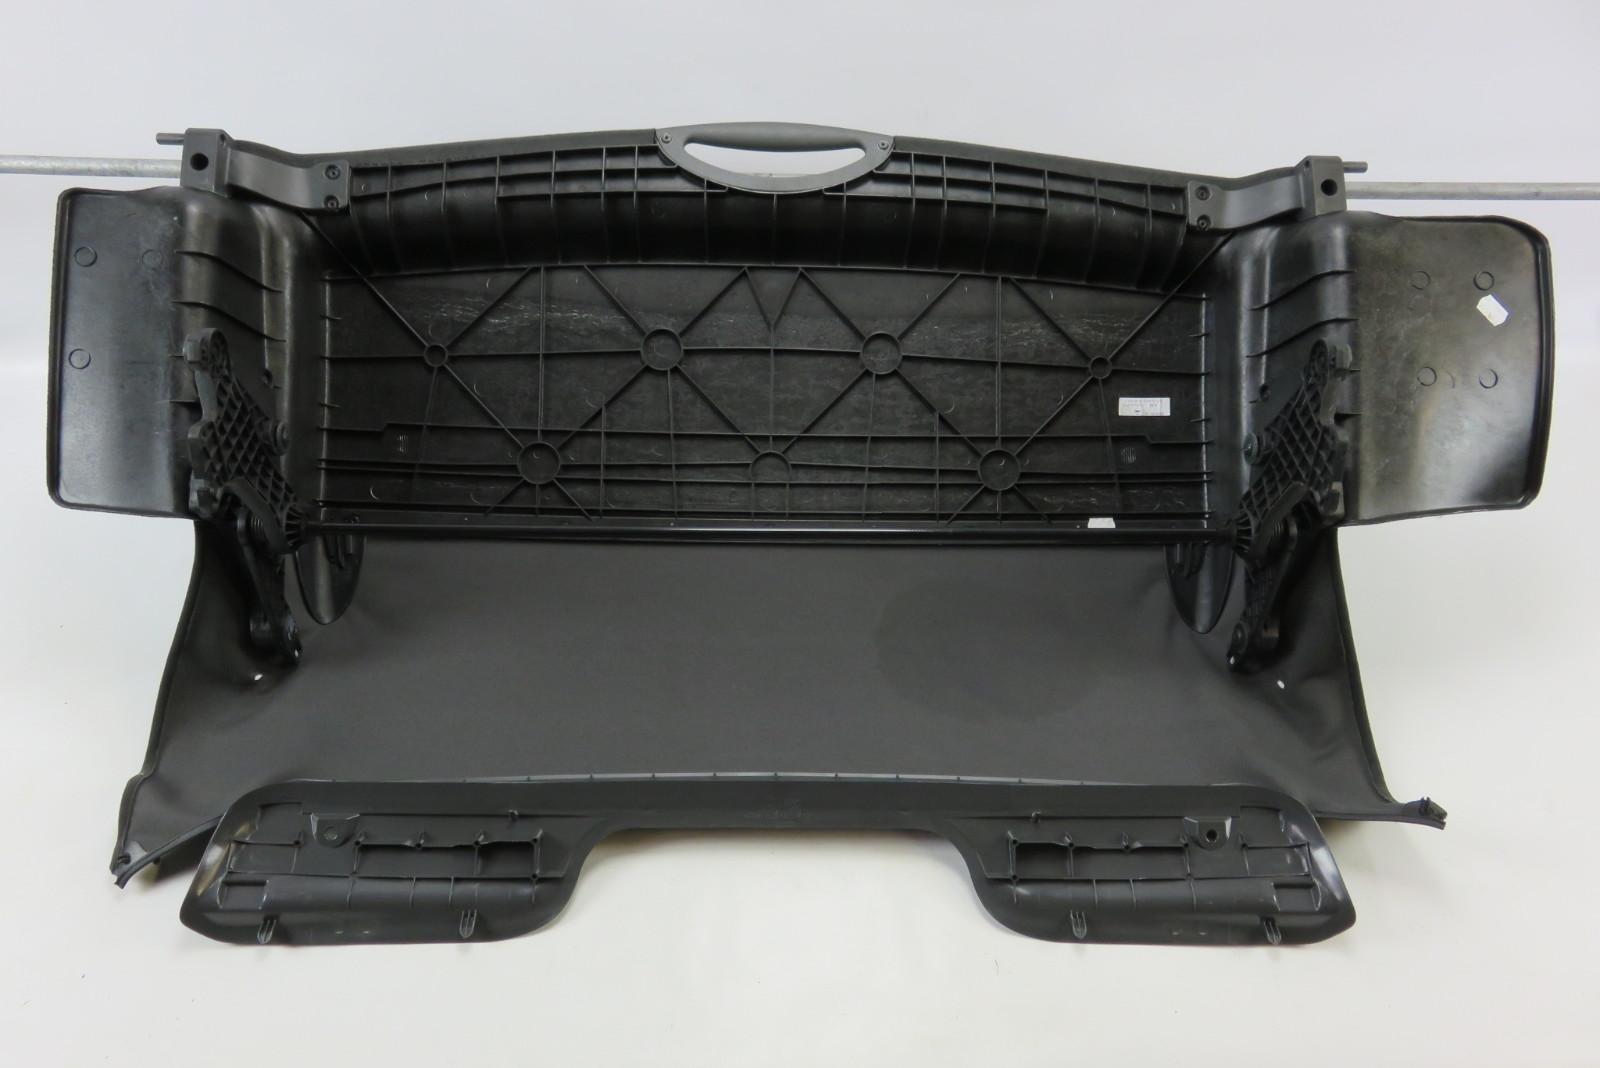 04 mercedes r230 sl55 amg sl500 interior luggage trim. Black Bedroom Furniture Sets. Home Design Ideas